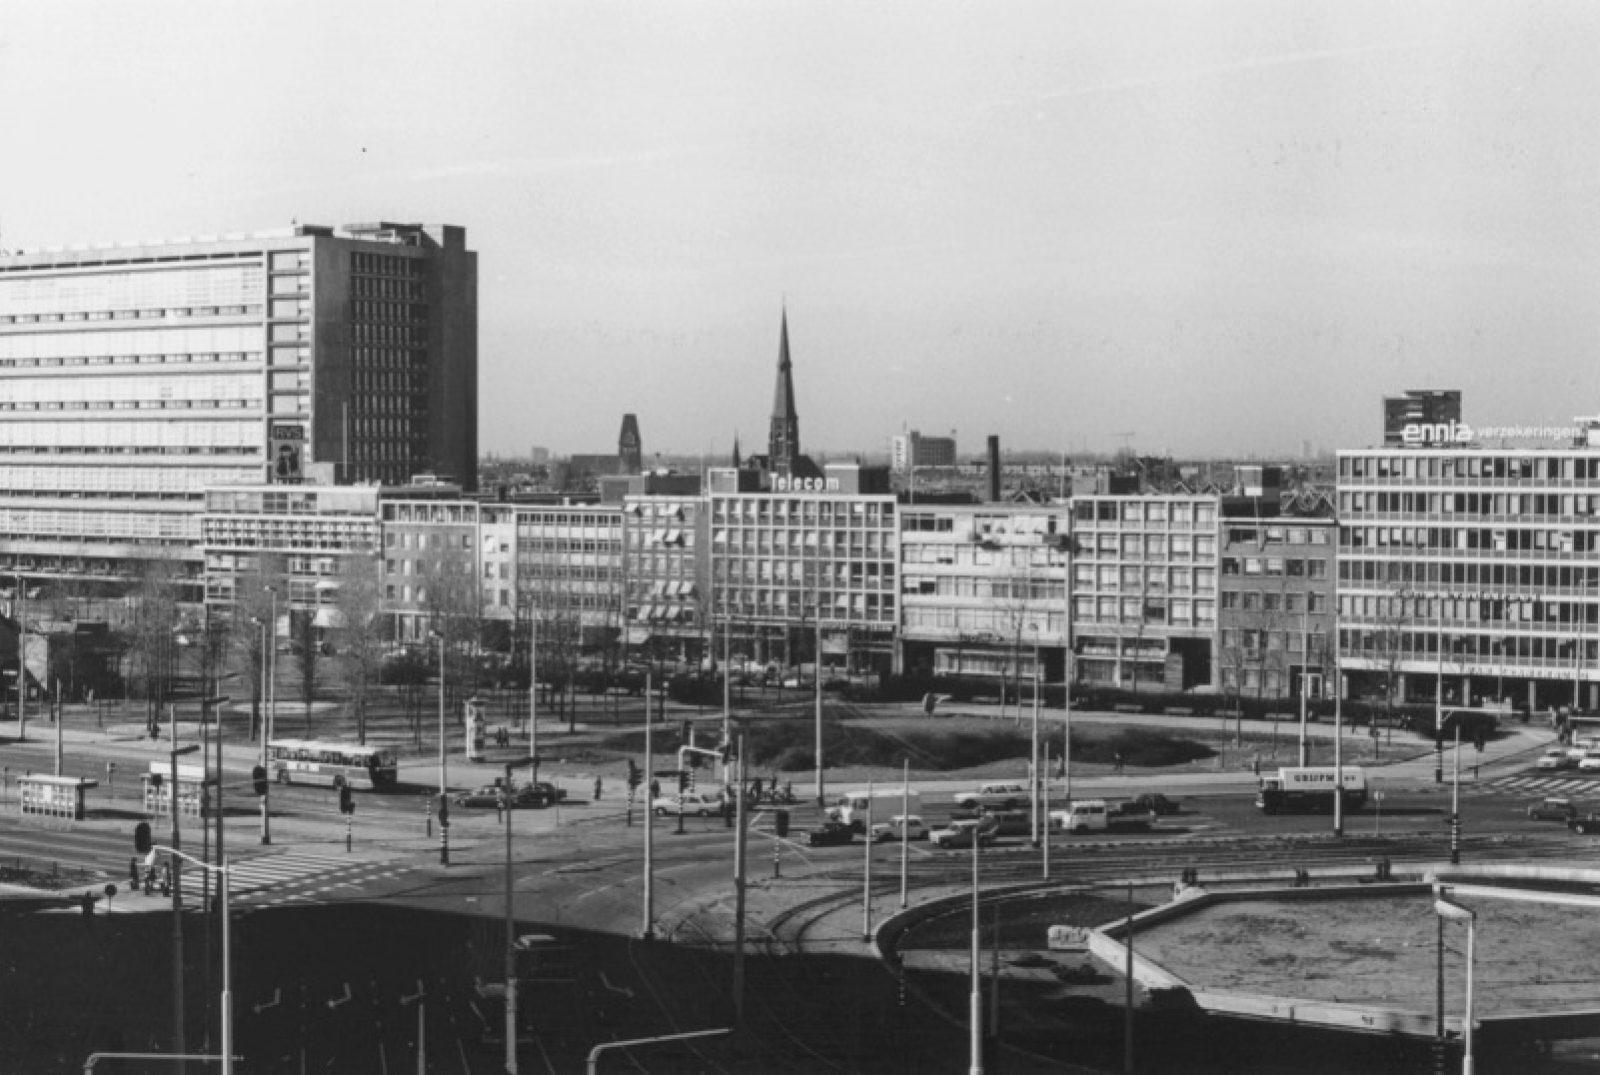 1976 Delftsestraat NL Rt SA 4100 2005 9316 01